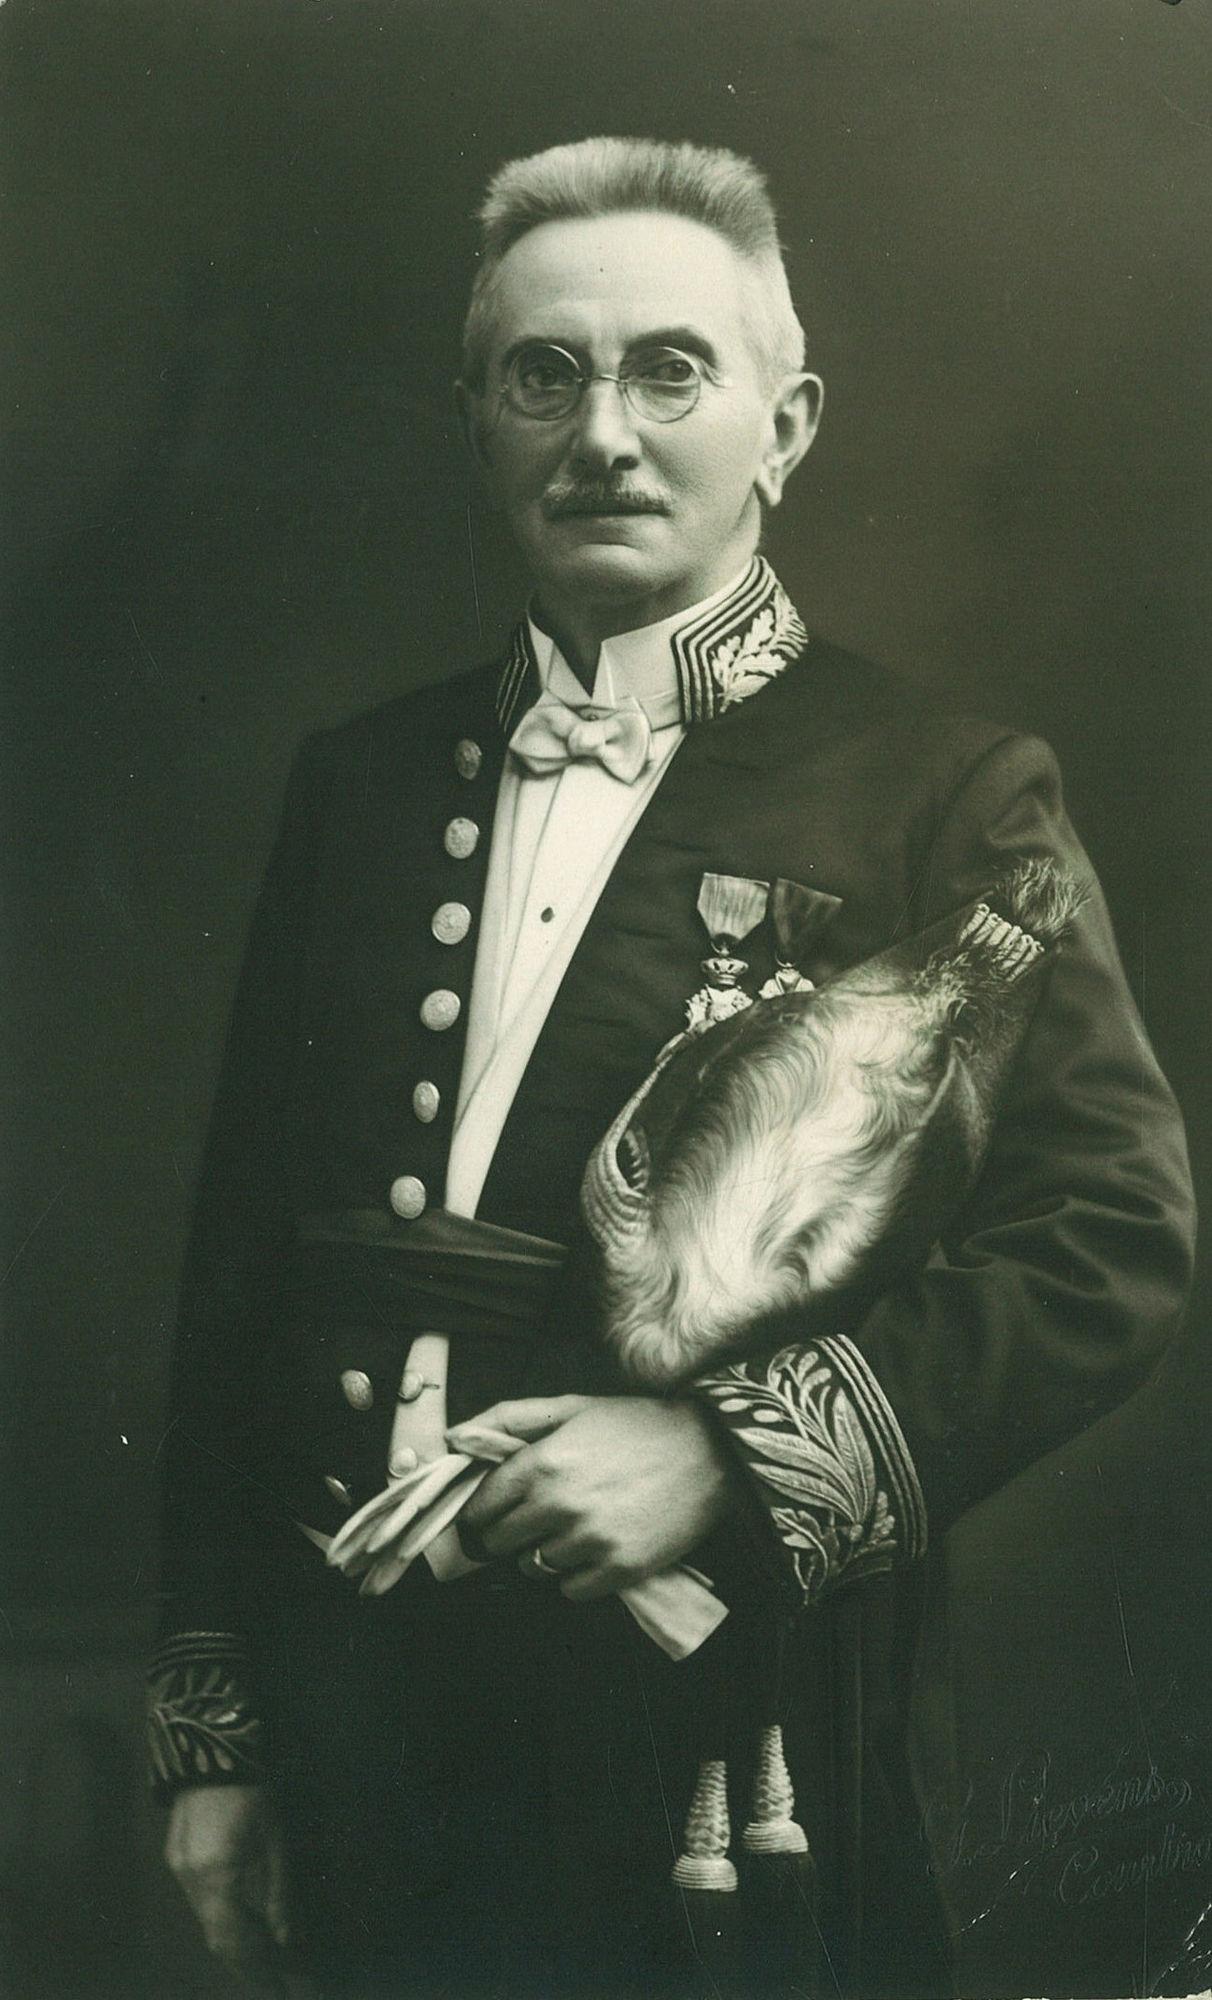 Burgemeester Leopold Gillon